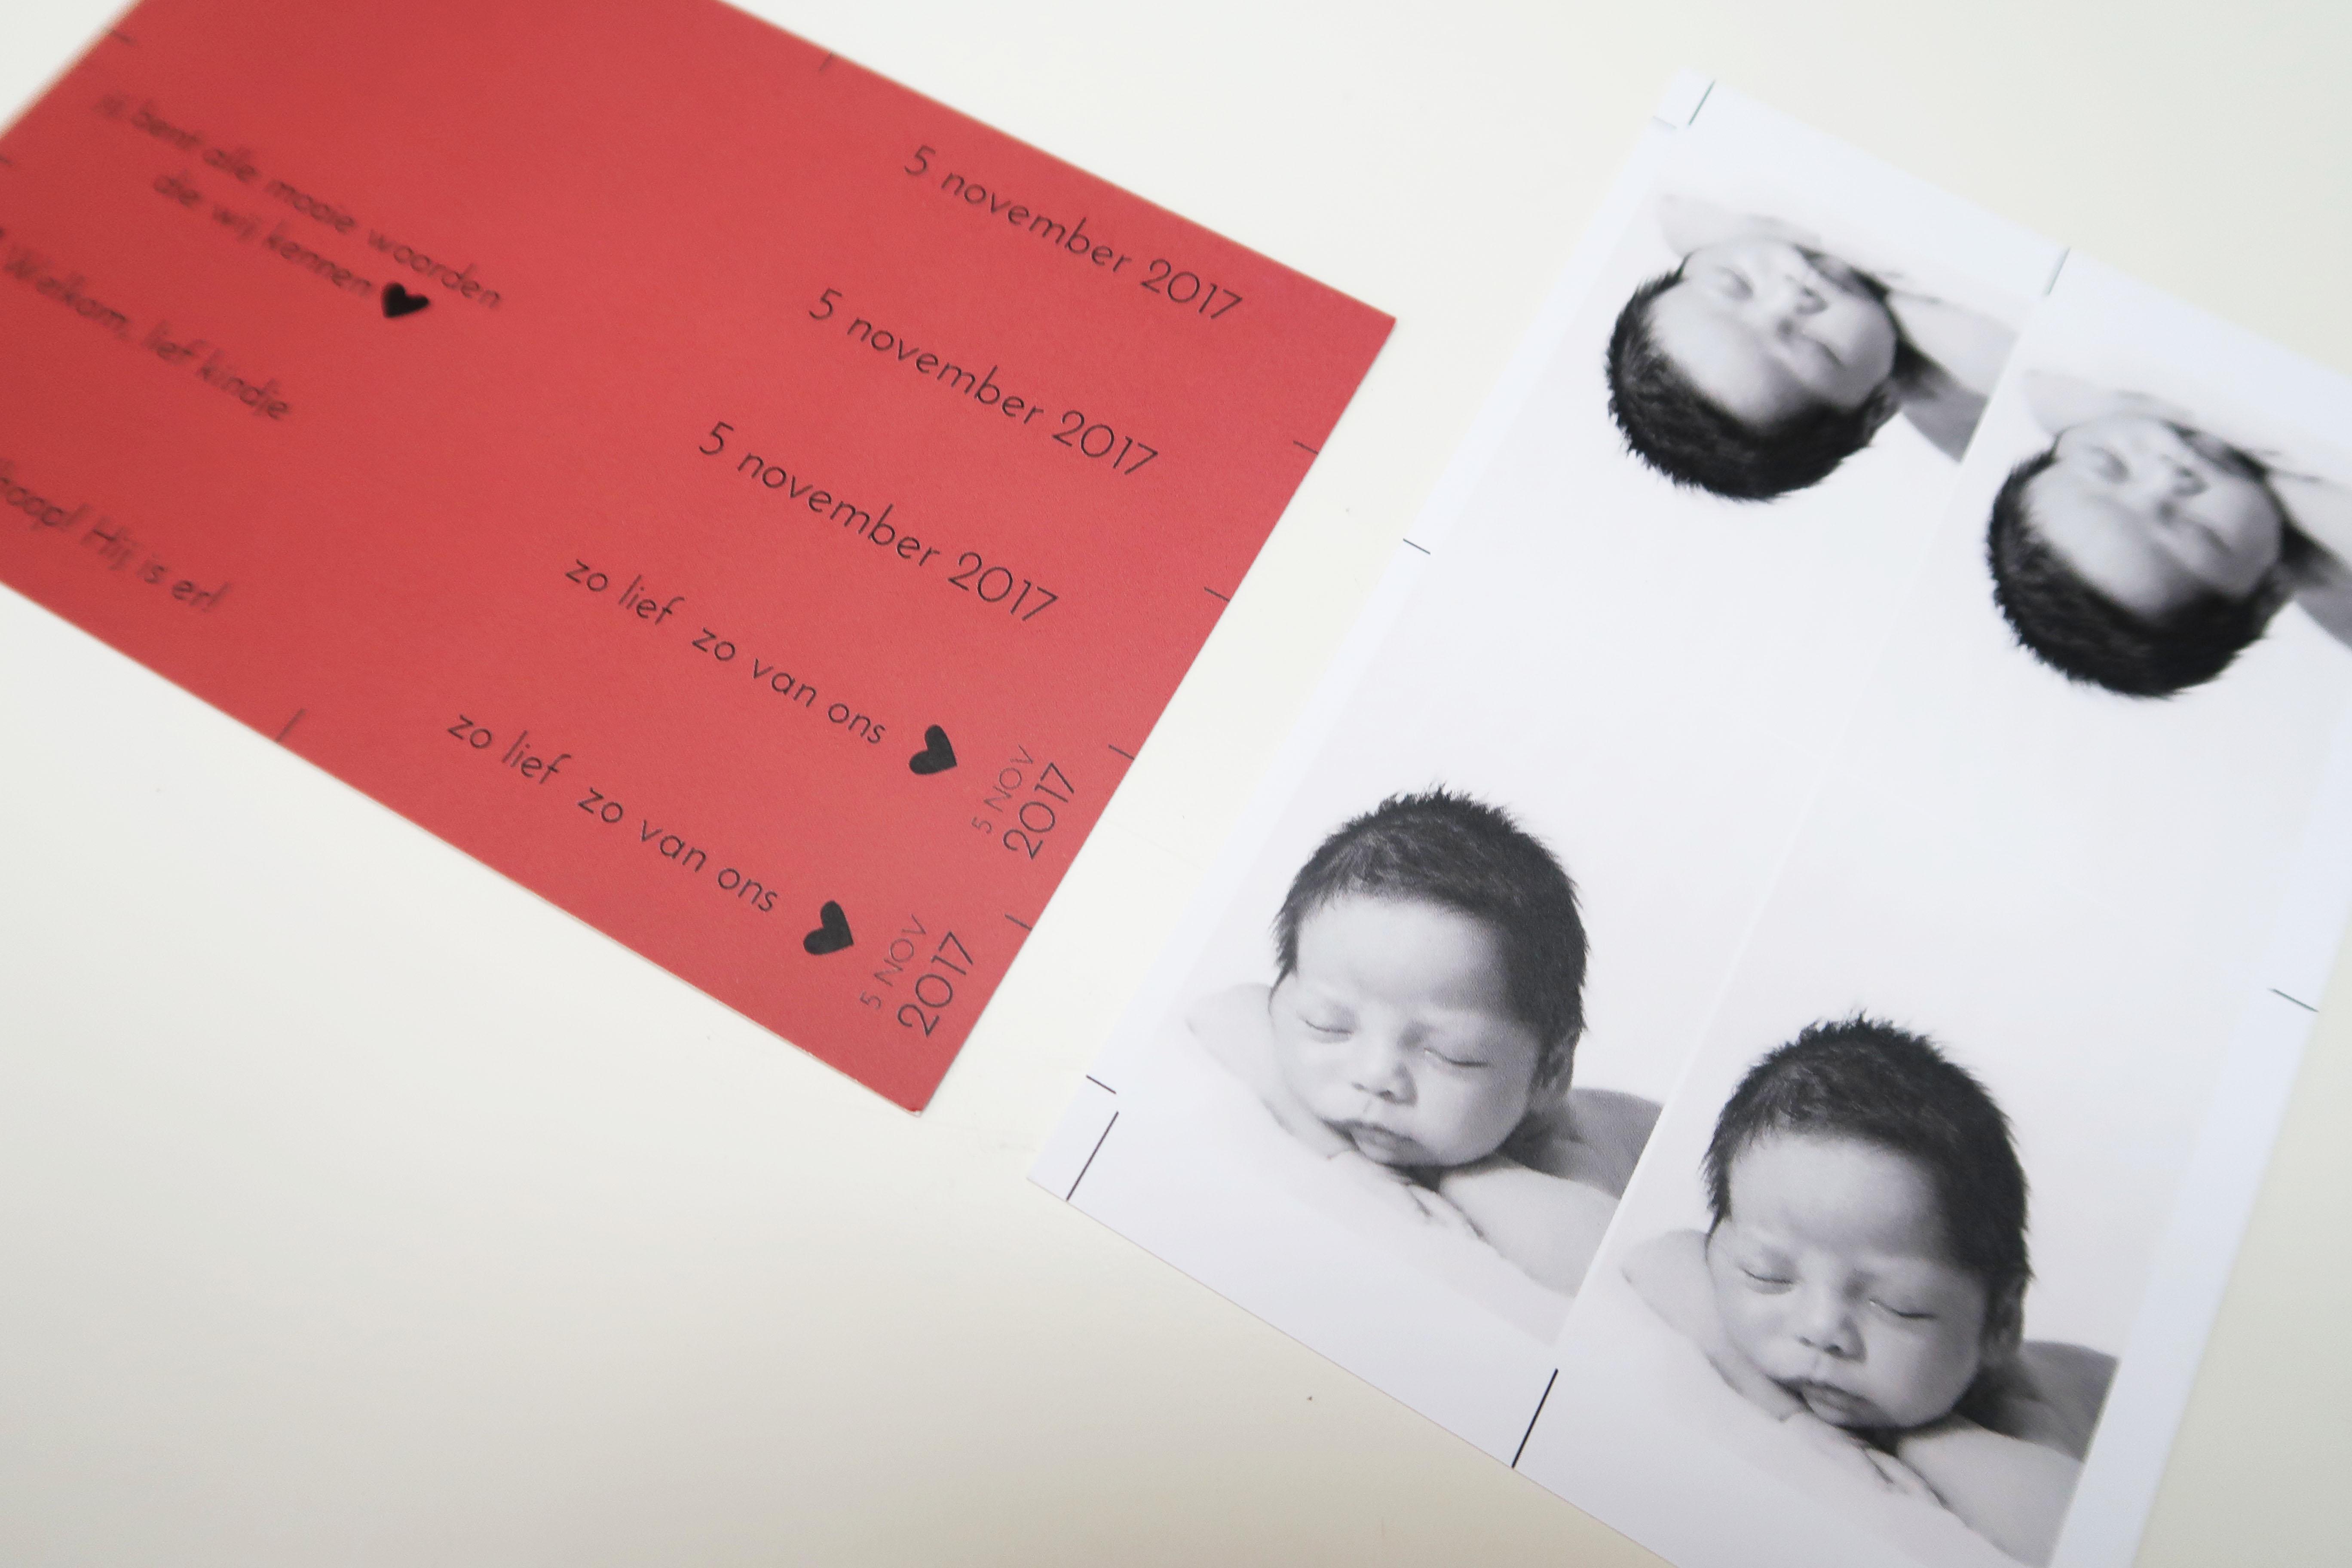 DIY labels om zelf te knippen geboortekaartj